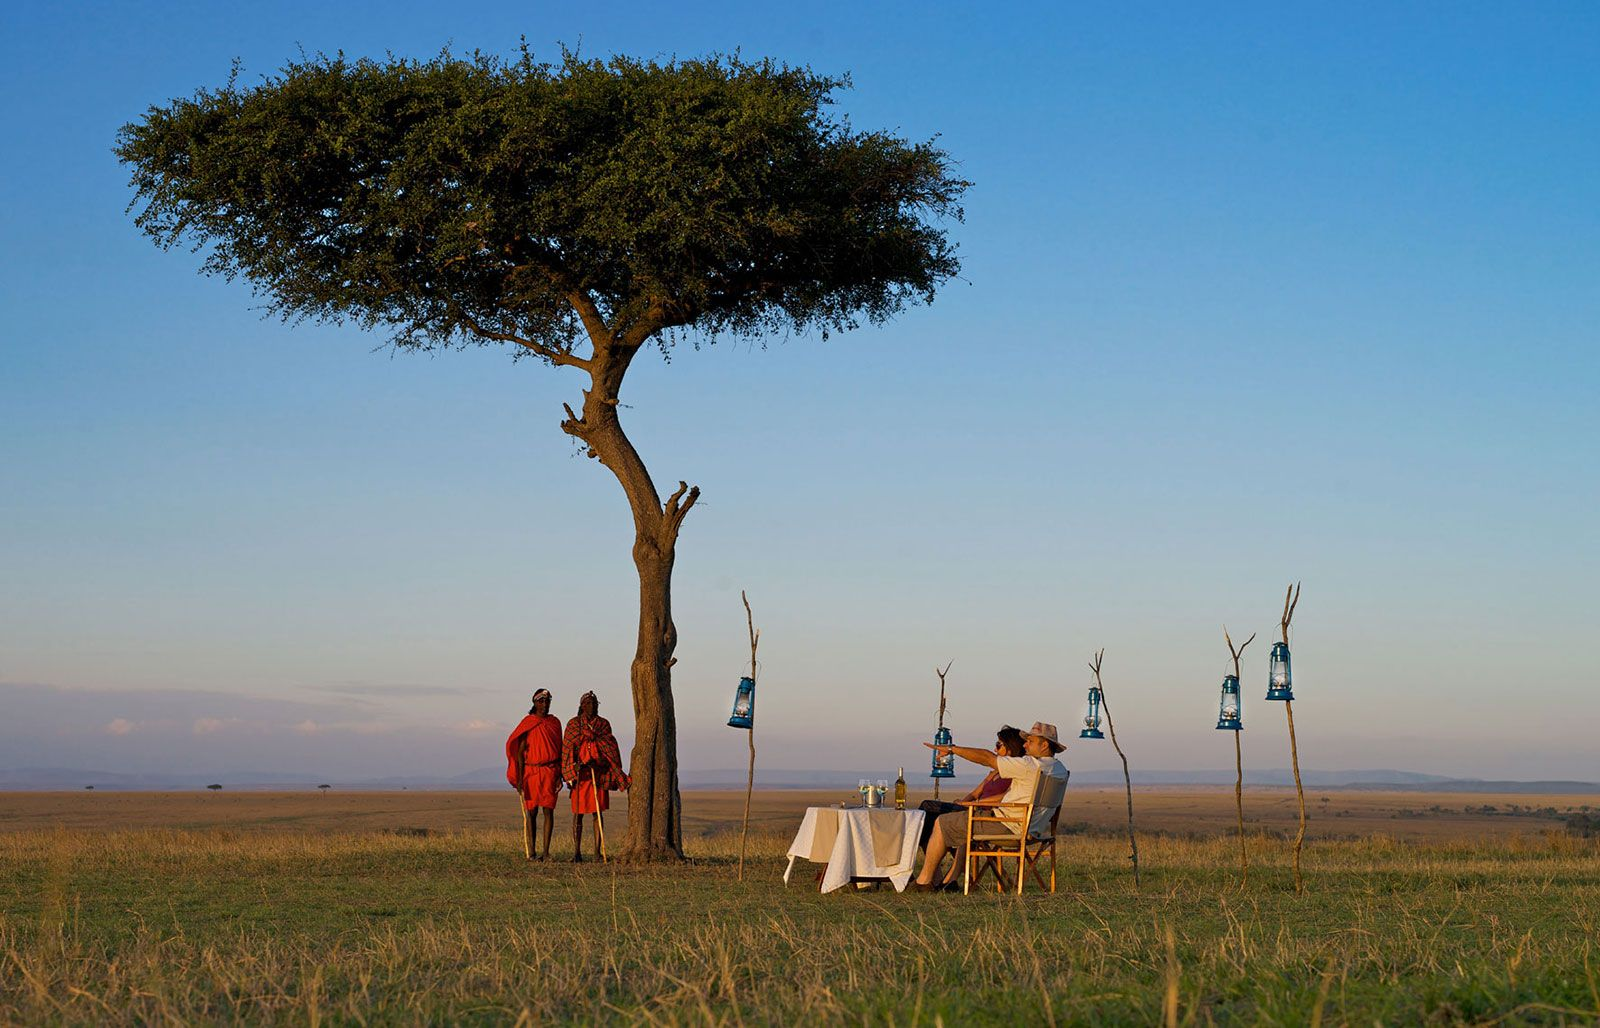 Masai Mara Introduction